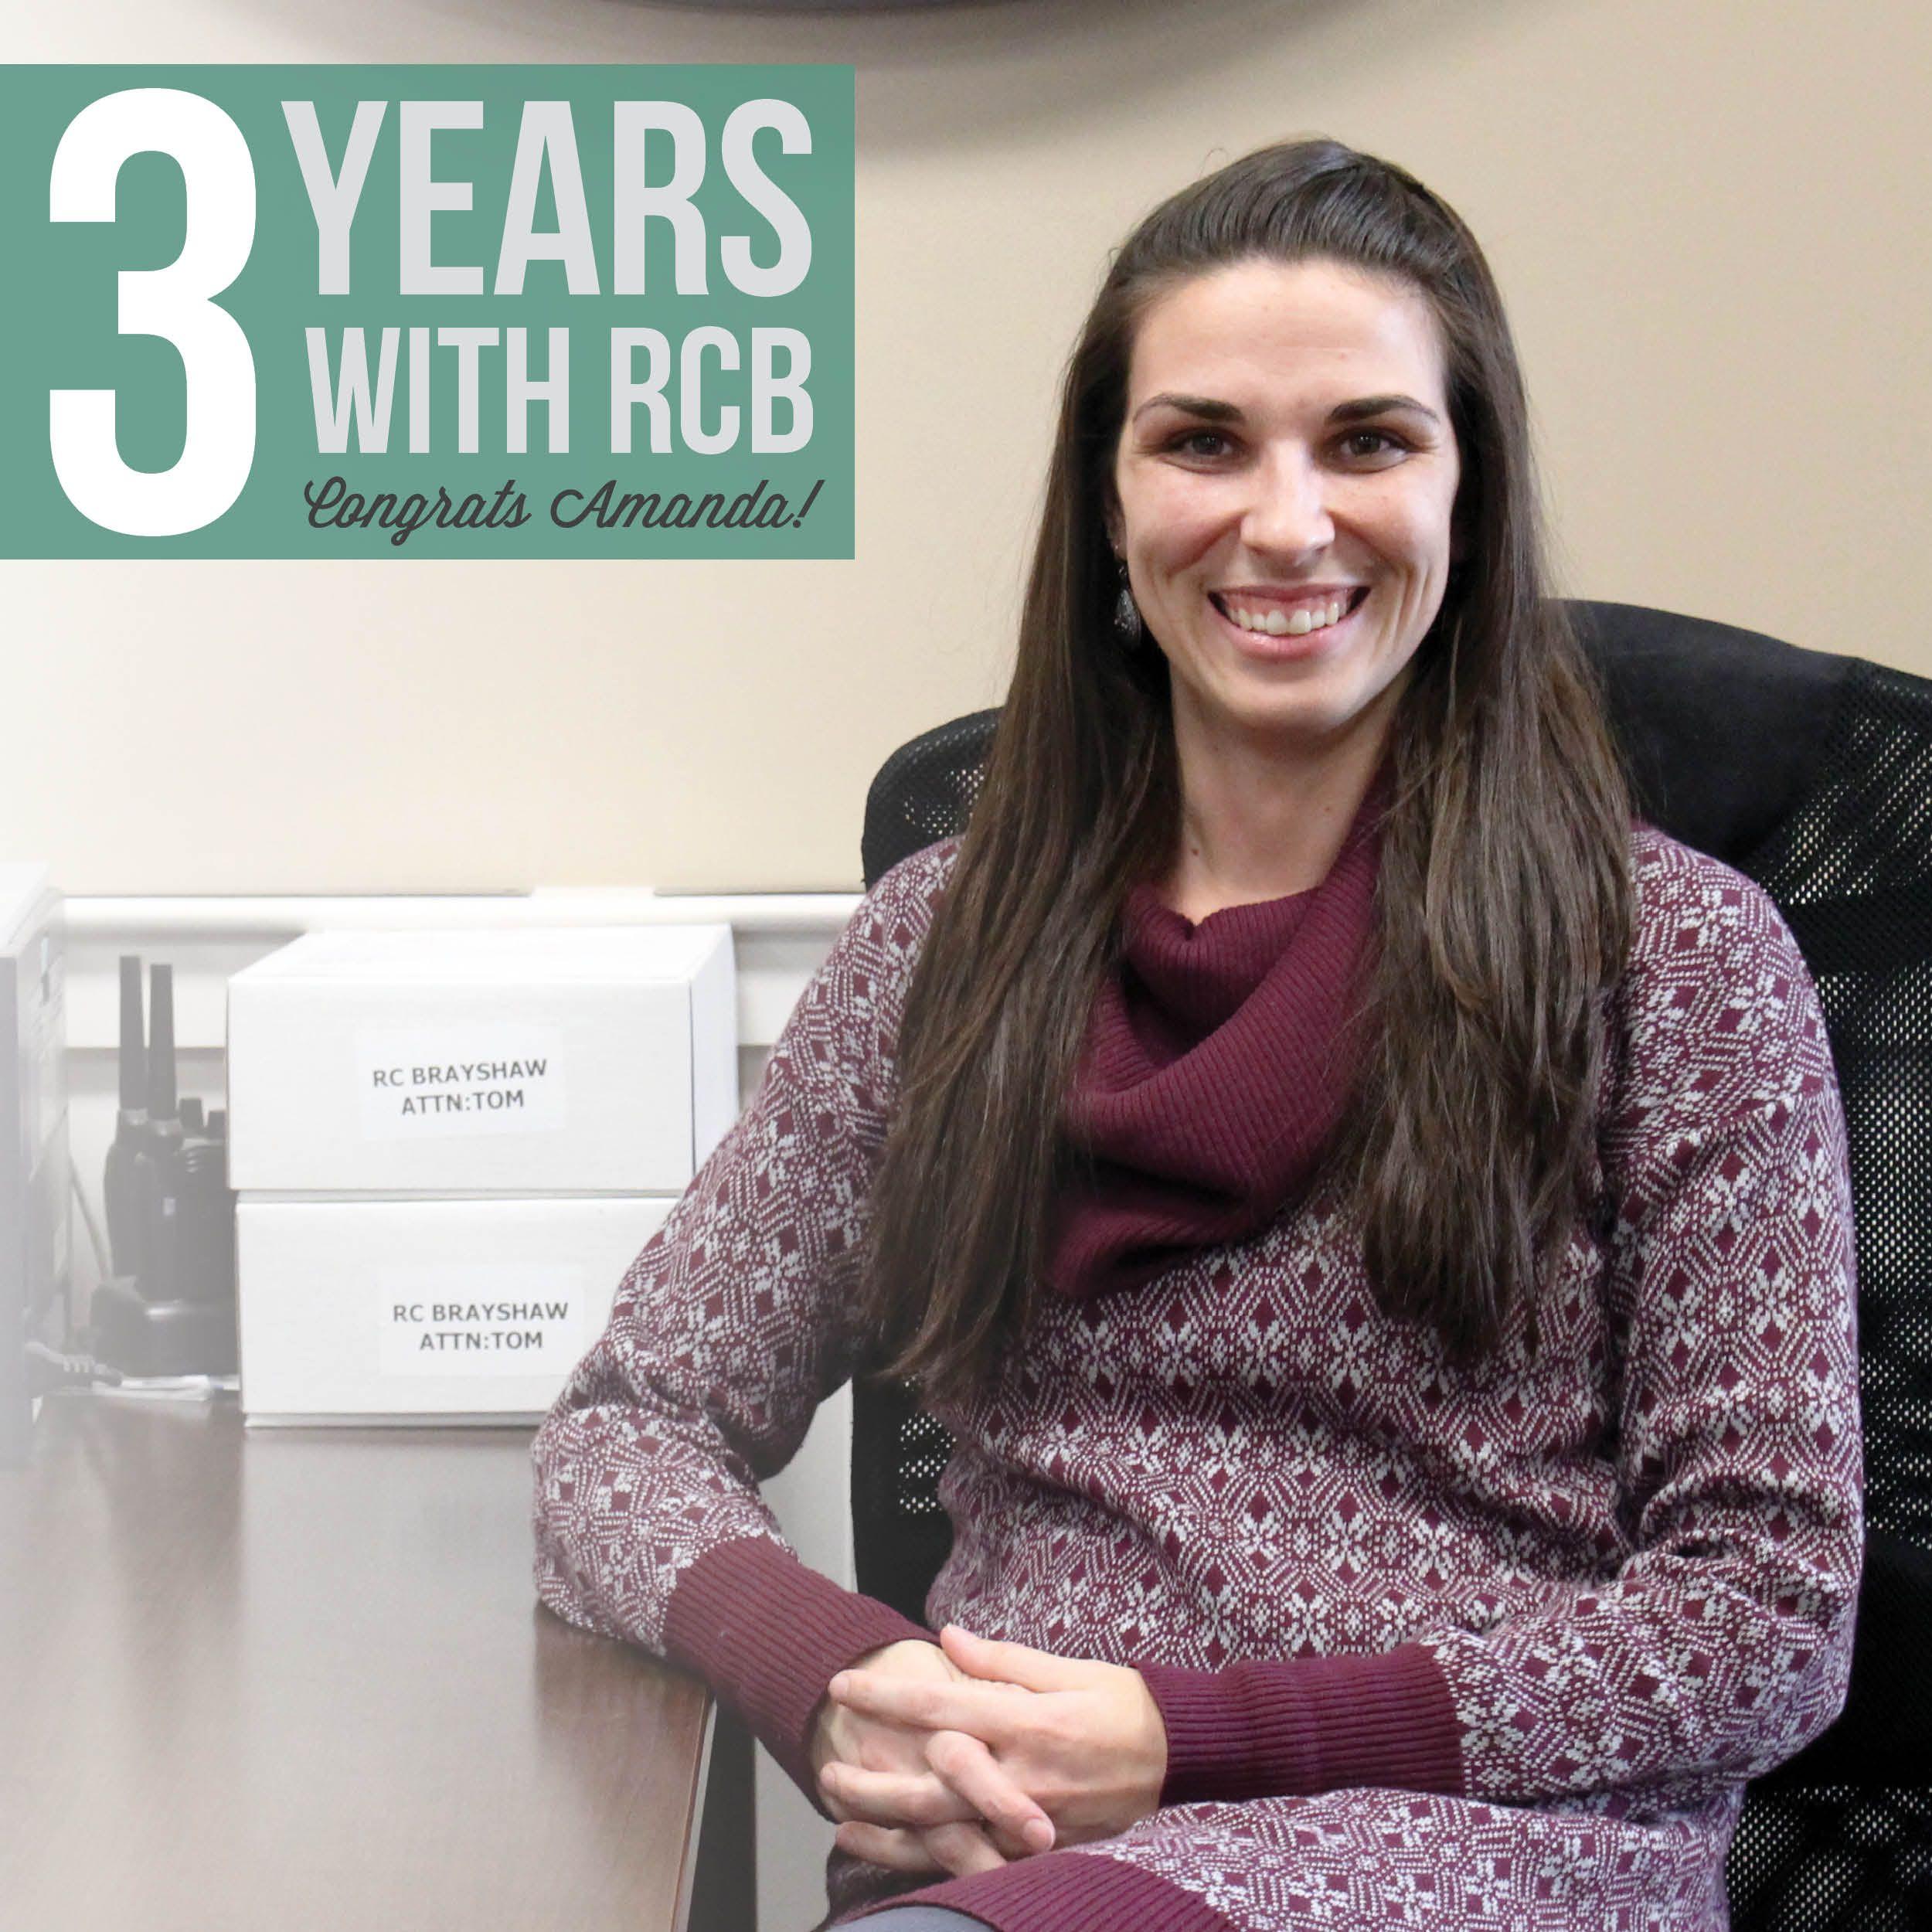 Happy 3 Year #Workiversary Amanda!